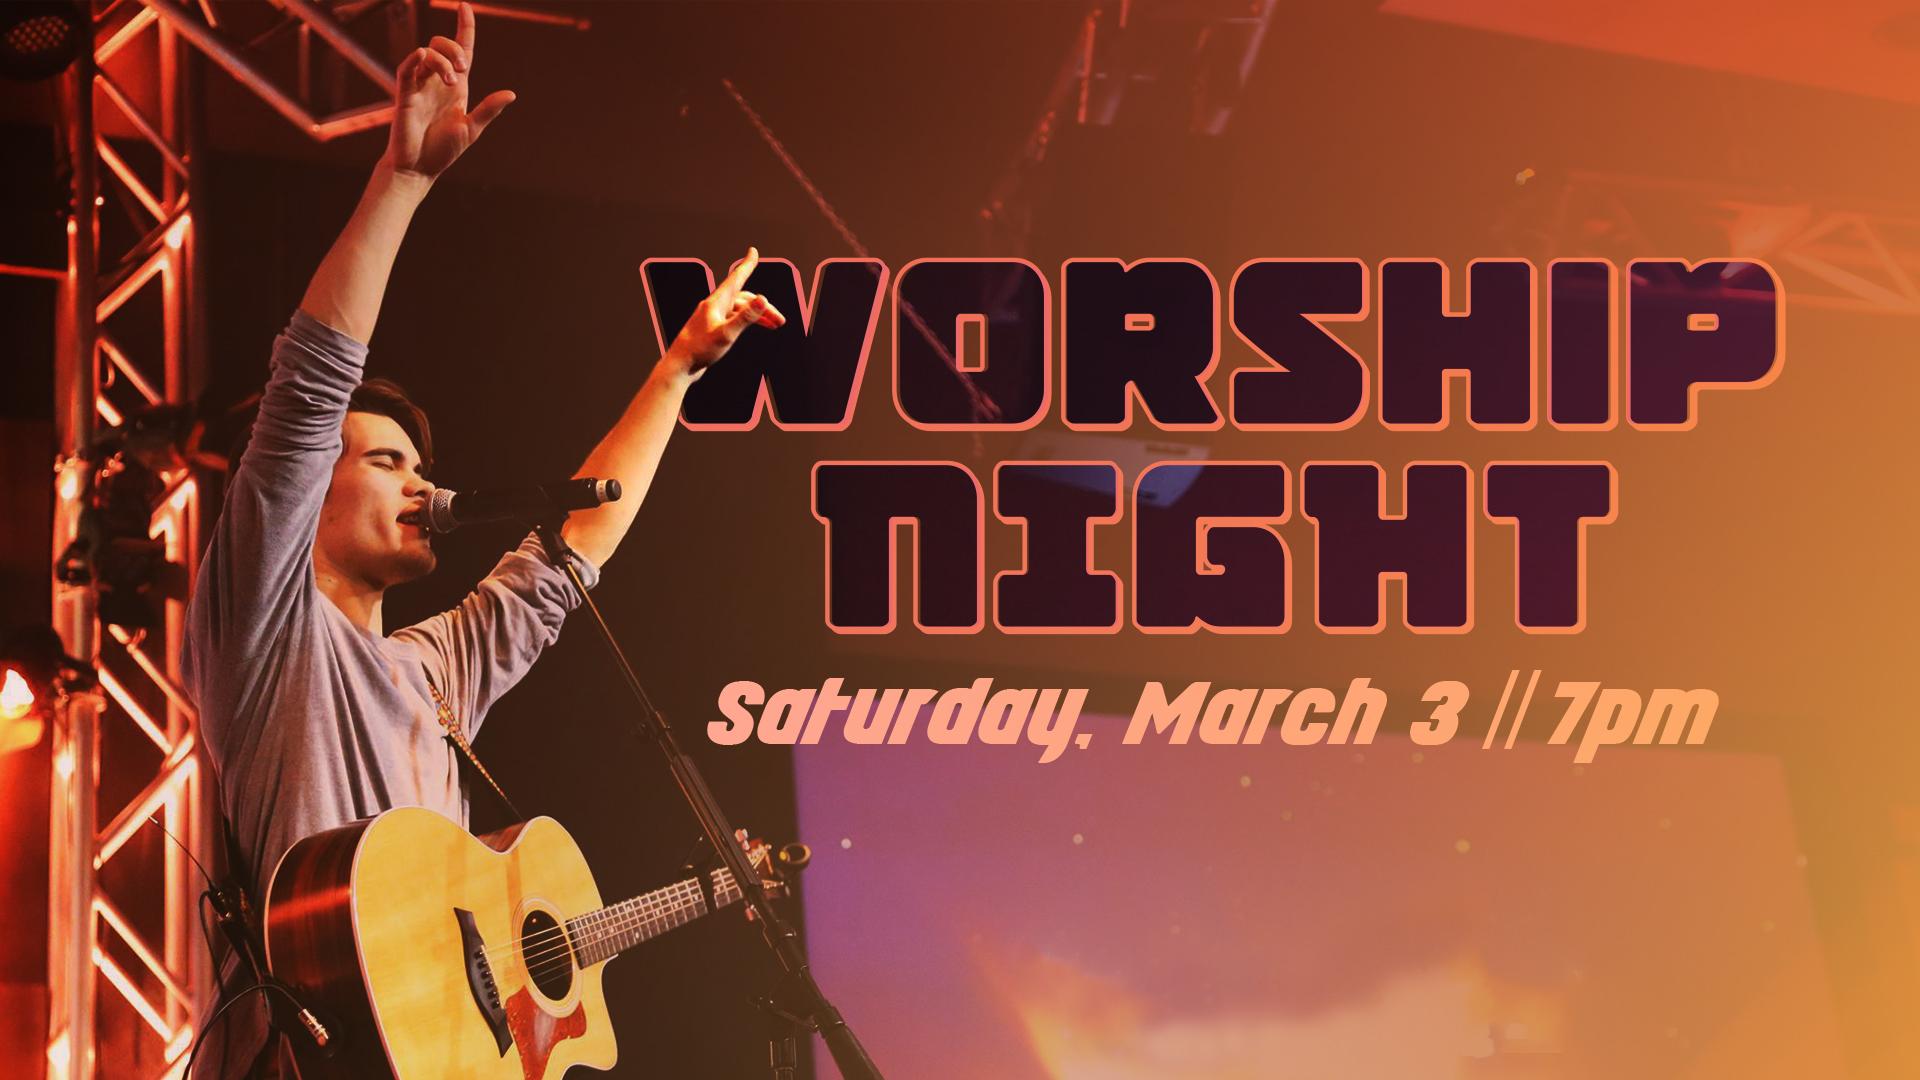 Halfmoon Worship Night Saturday March 3, 2018 7PM